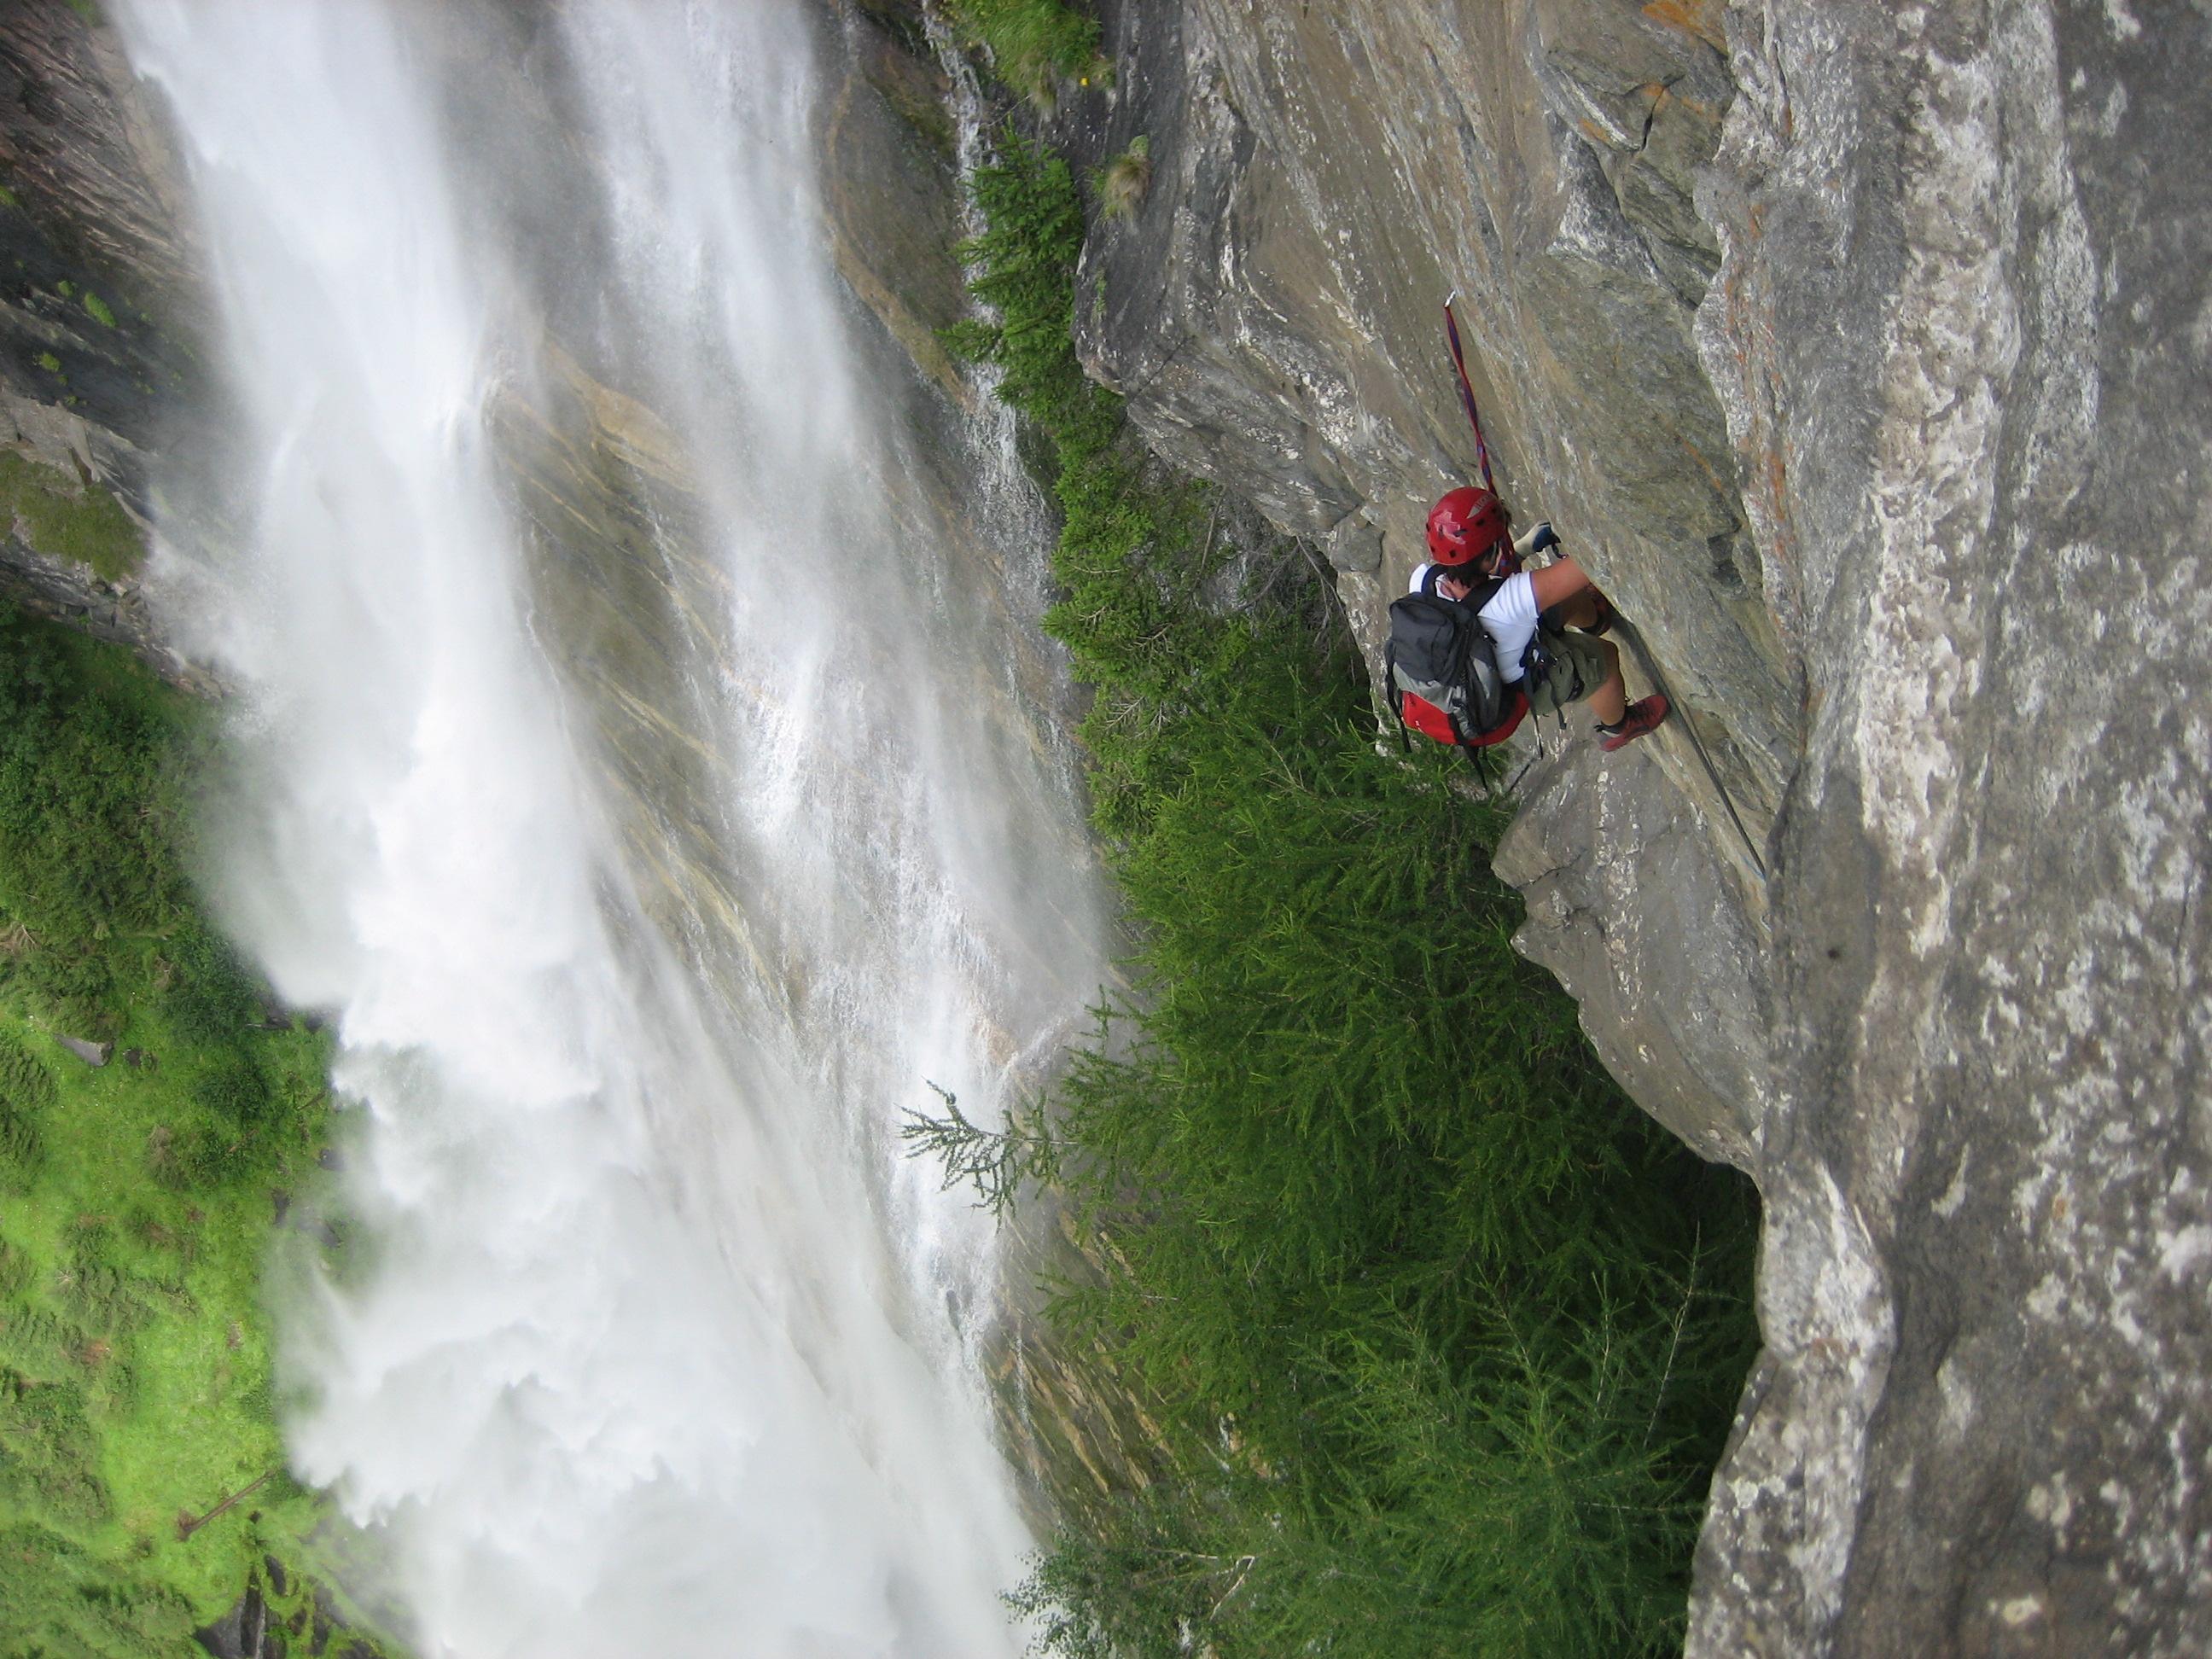 Klettersteig Fallbach : Fallbach klettersteig bergsteigen.com